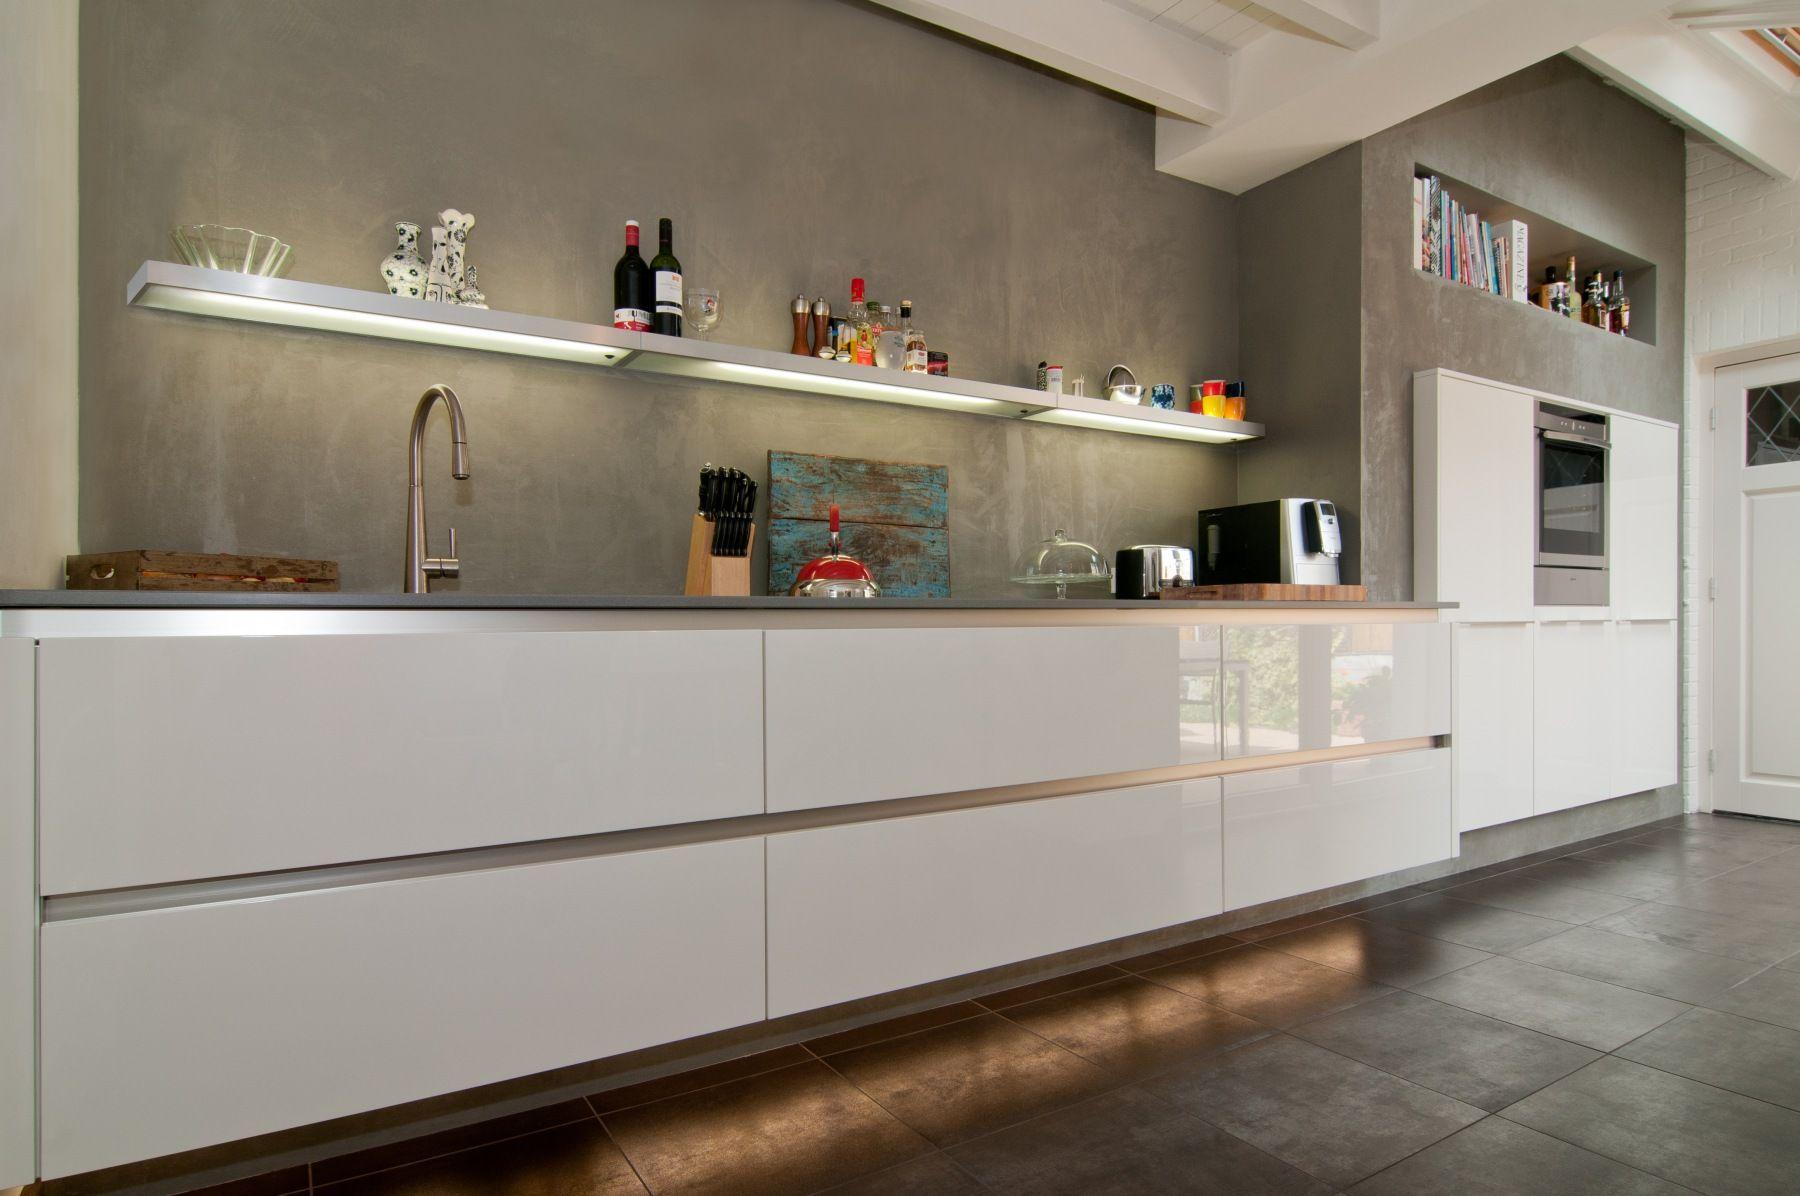 Keuken Kleine Kleur : Keuken kleuren beton look achterwand keuken indeling